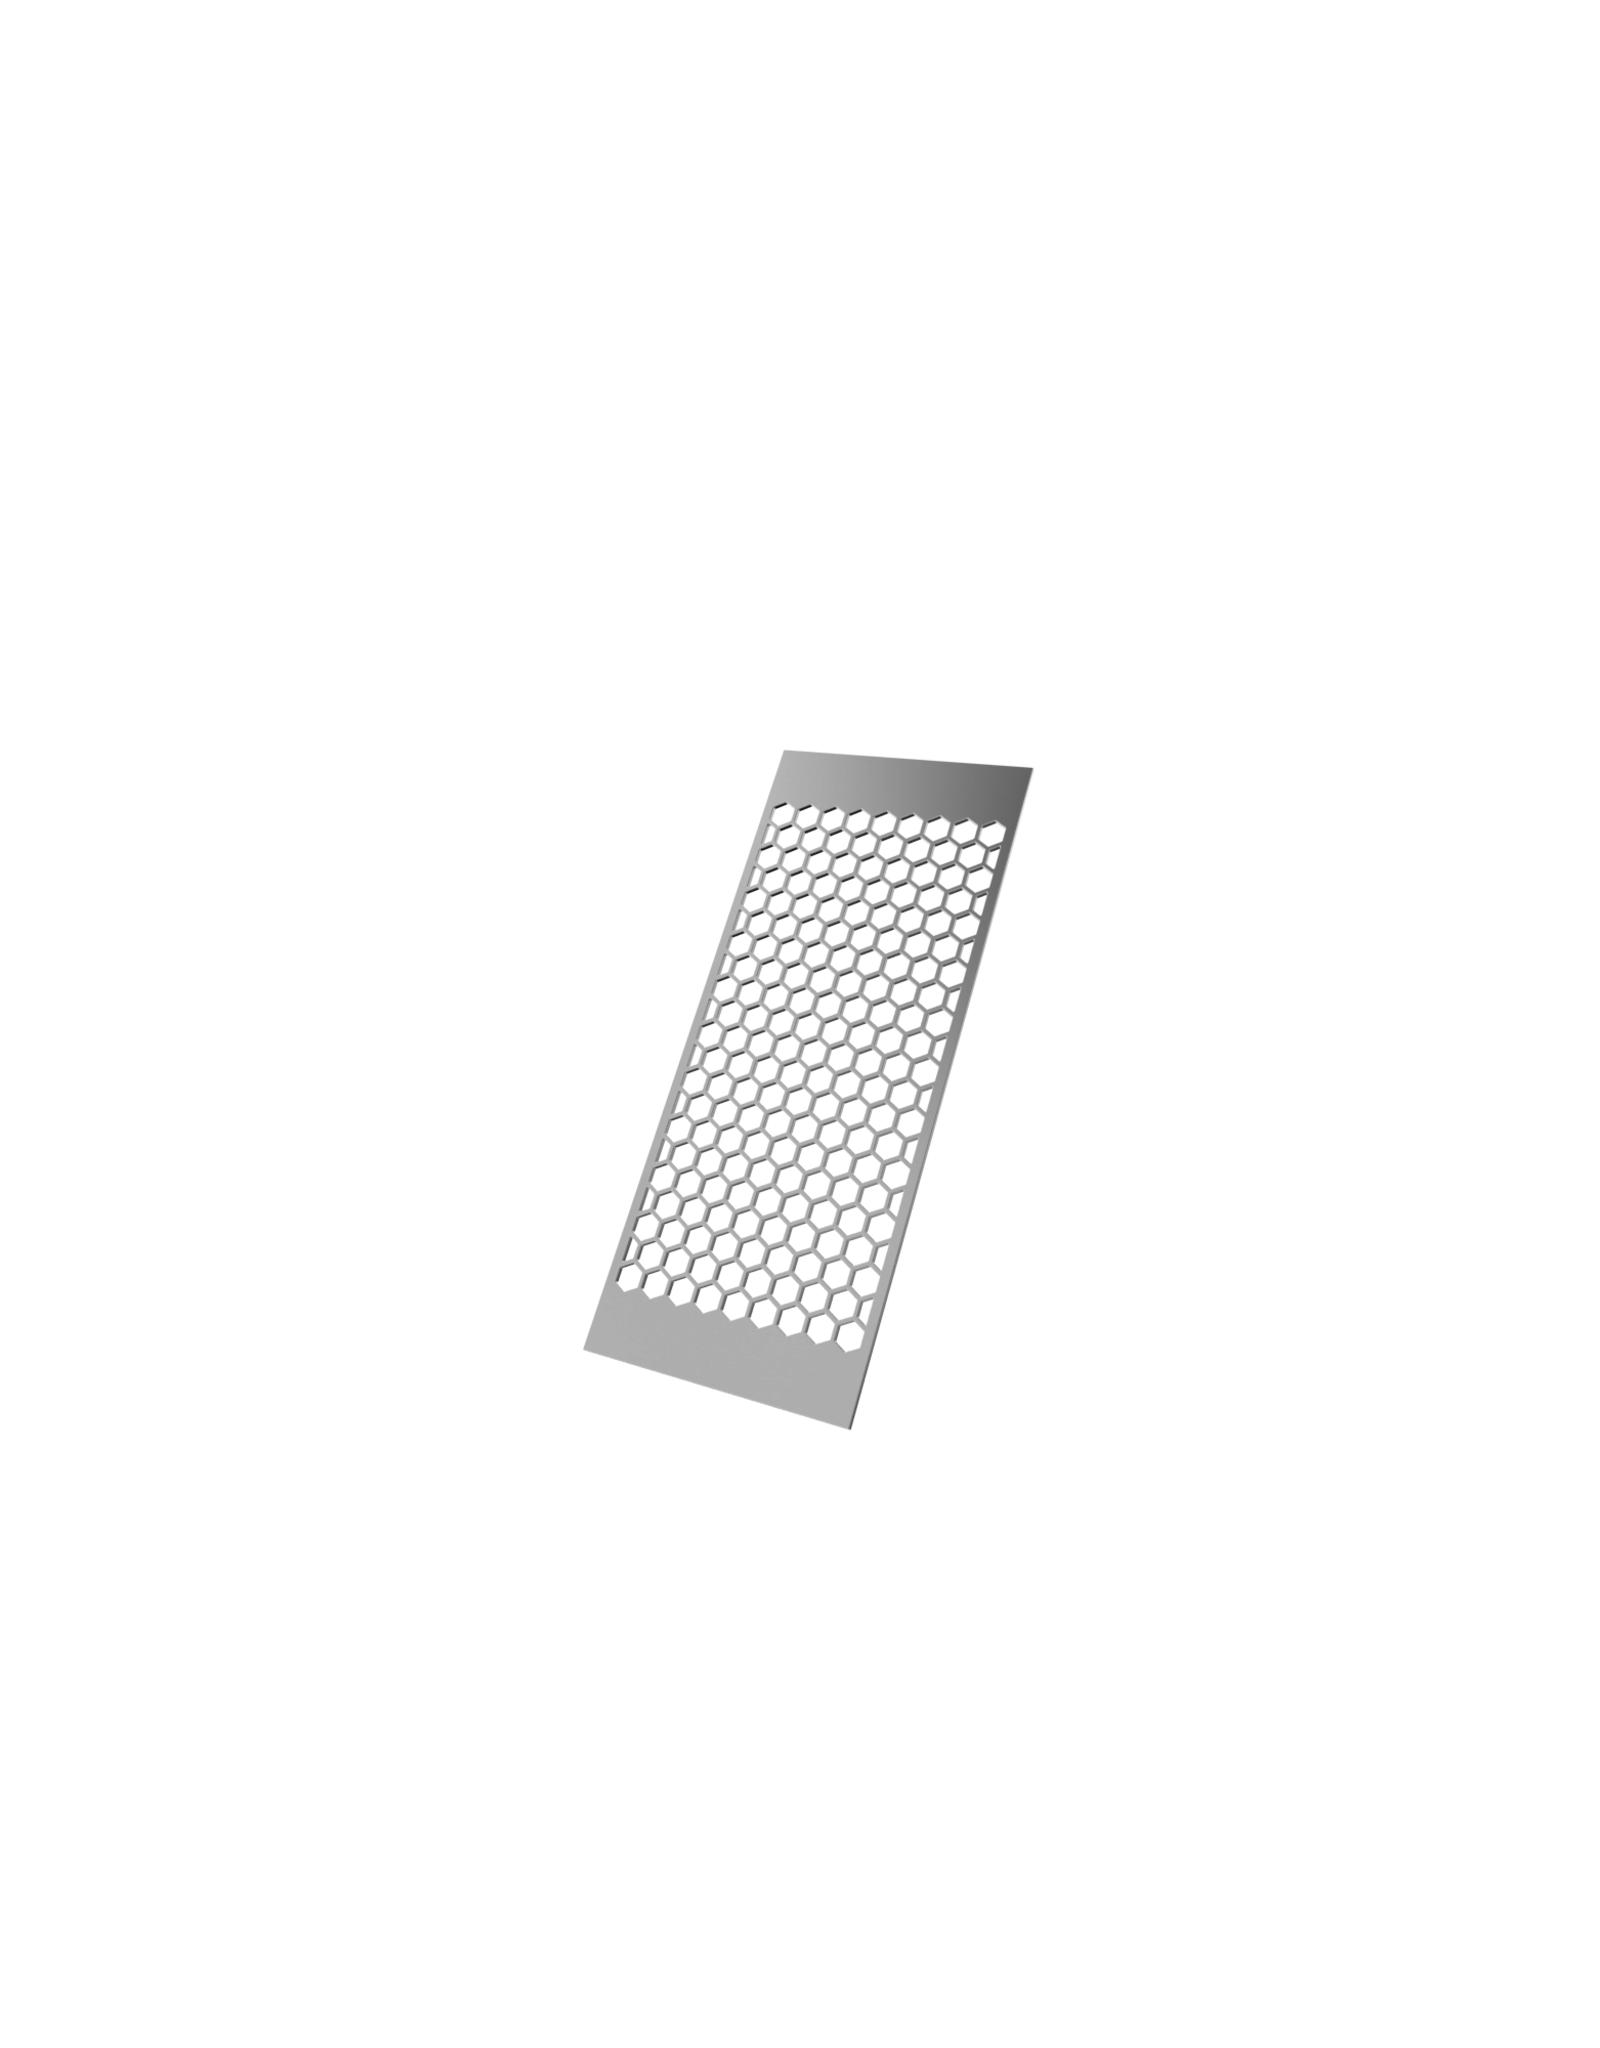 Vandy Vape VandyVape Kylin M 0.2Ω Mesh Coils